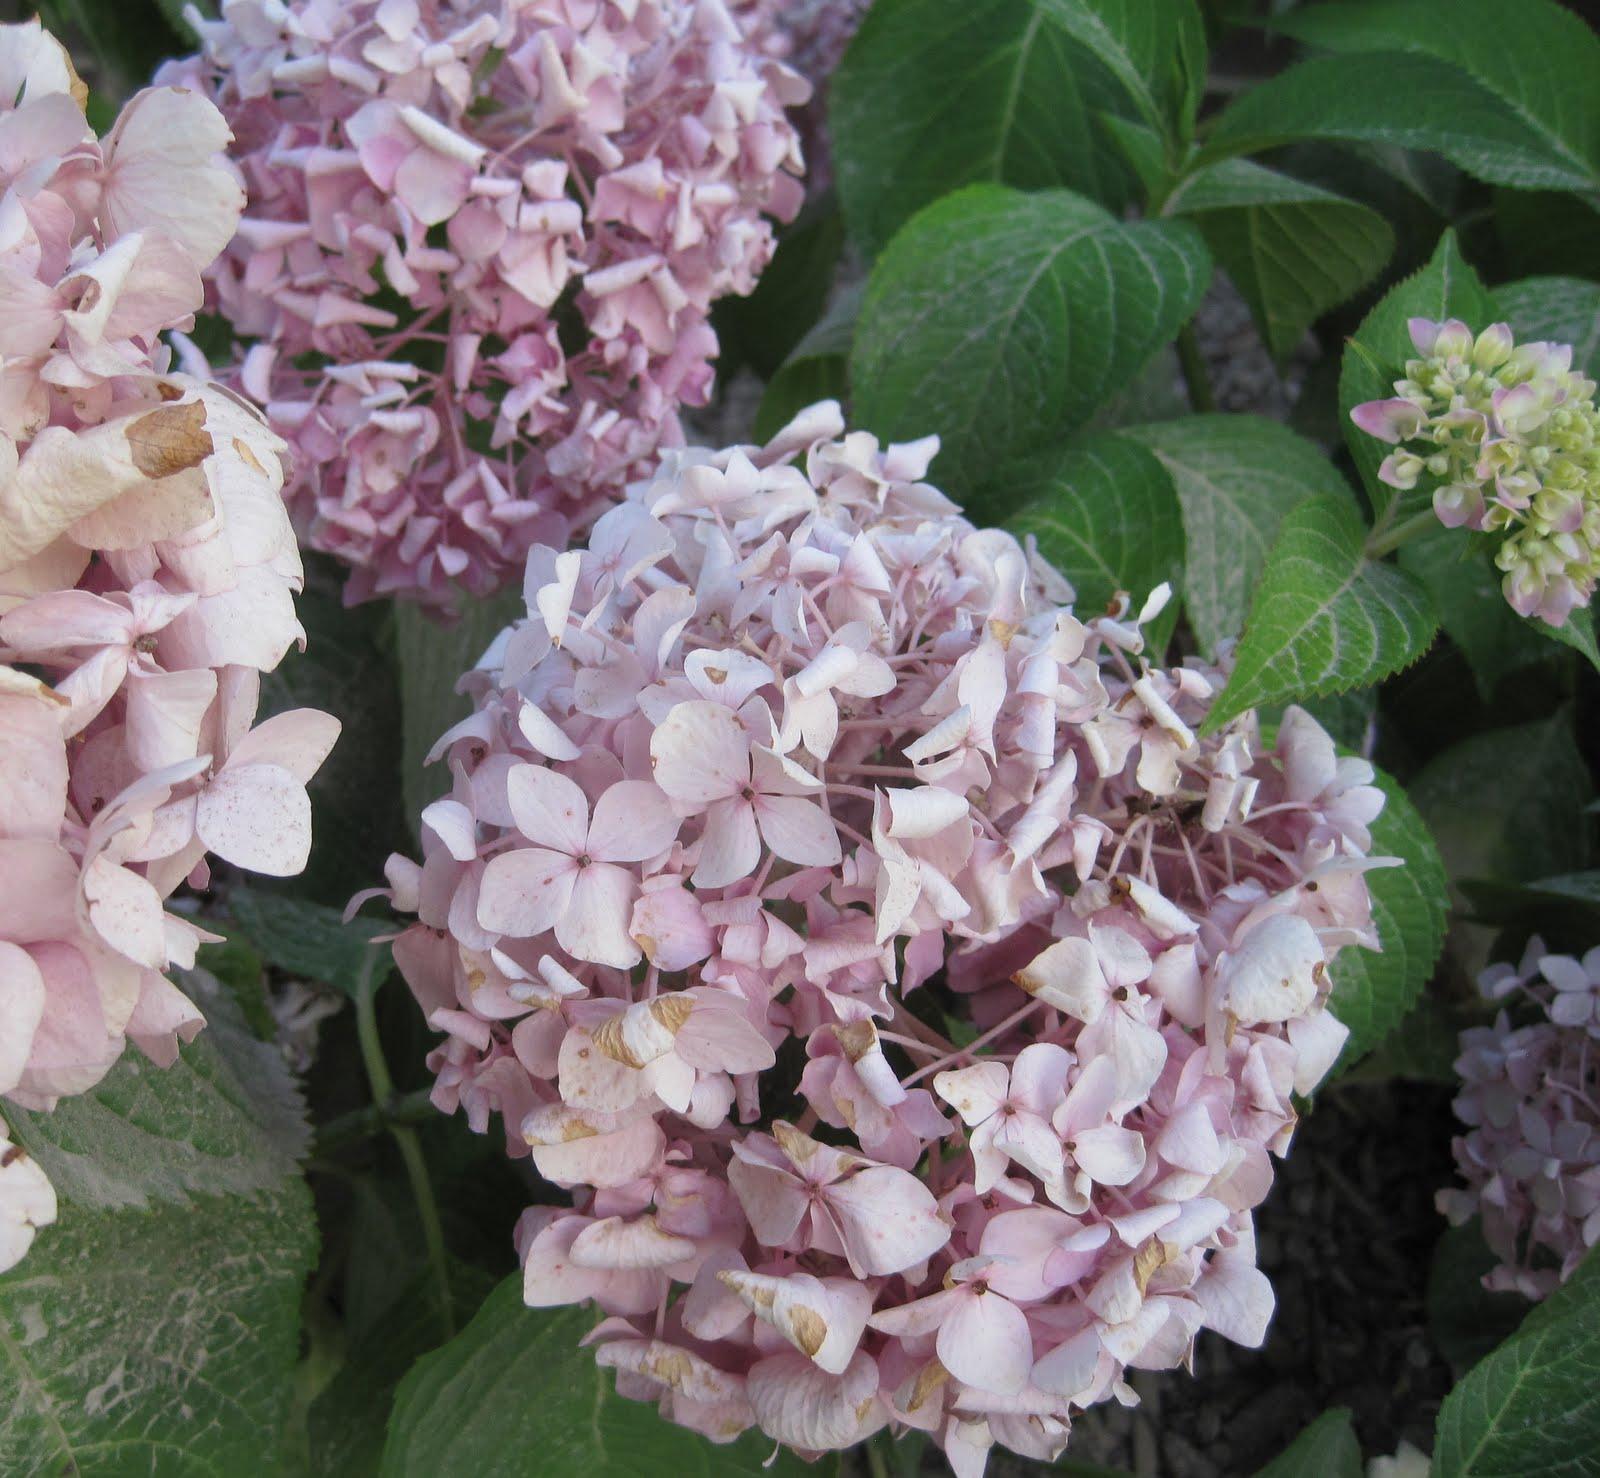 Garden Design Update Dust The Hydrangeas By The New Patio